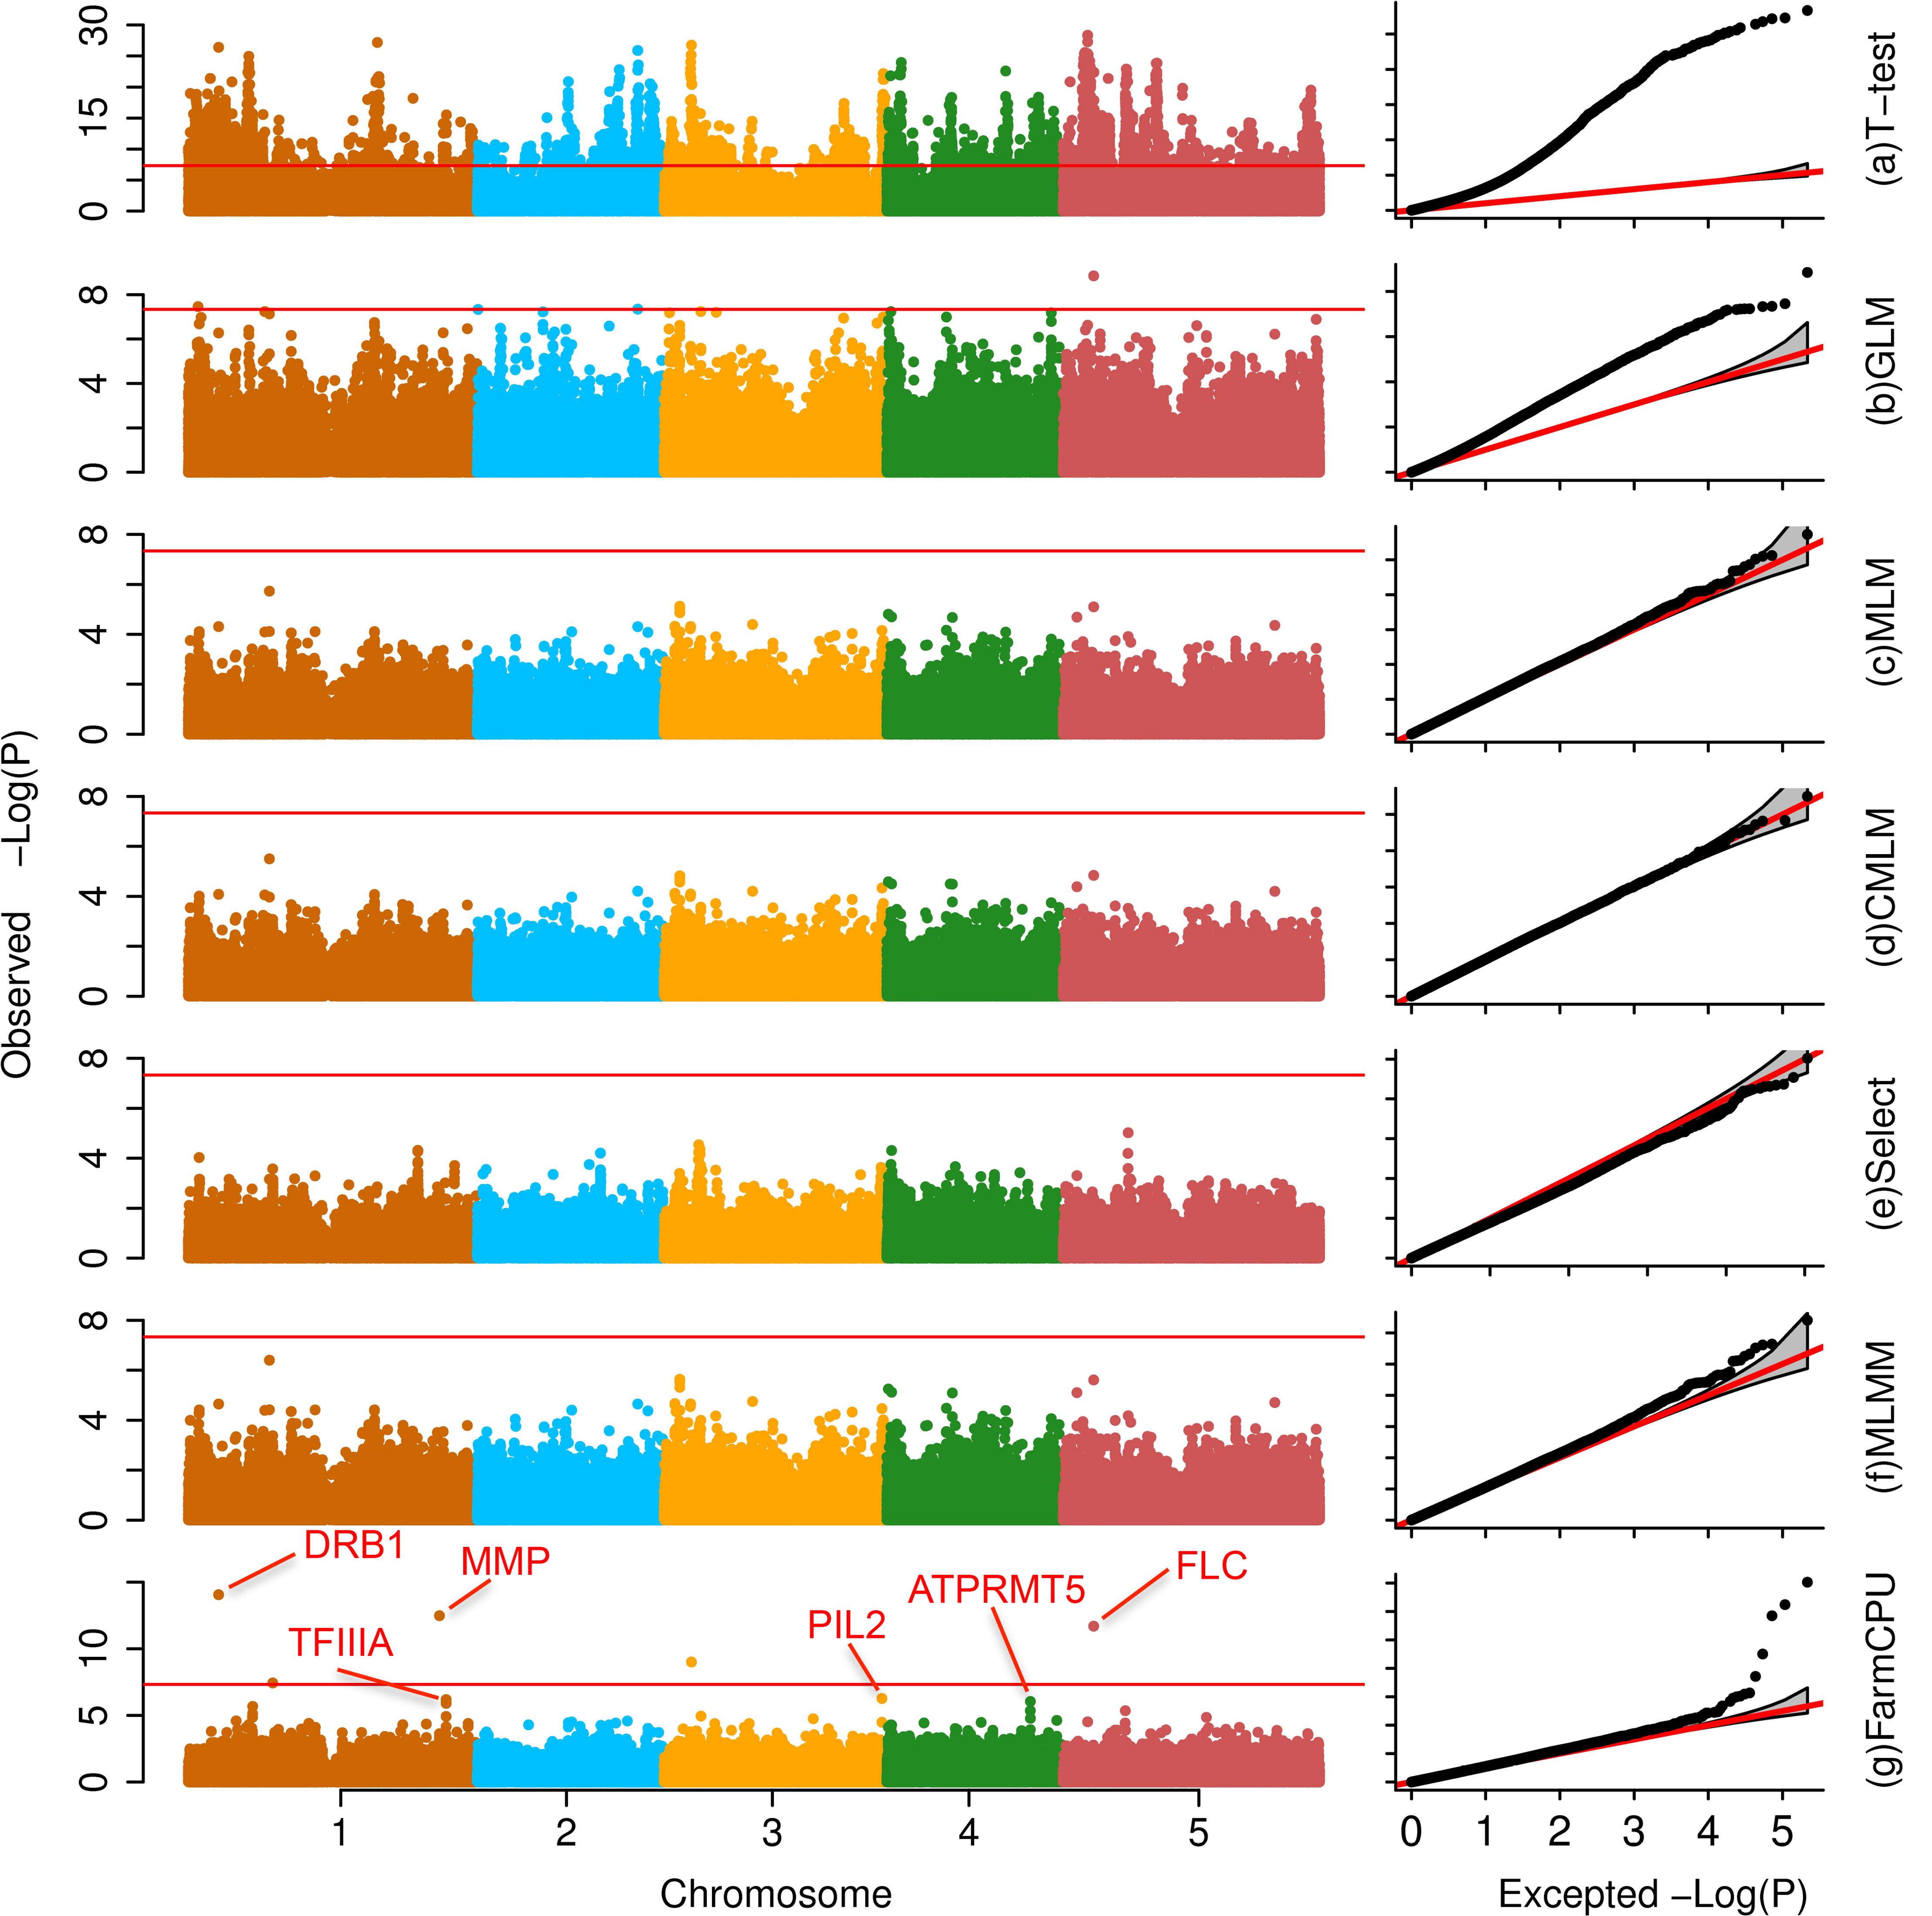 Association studies of flowering time in <i>Arabidopsis thaliana</i>.